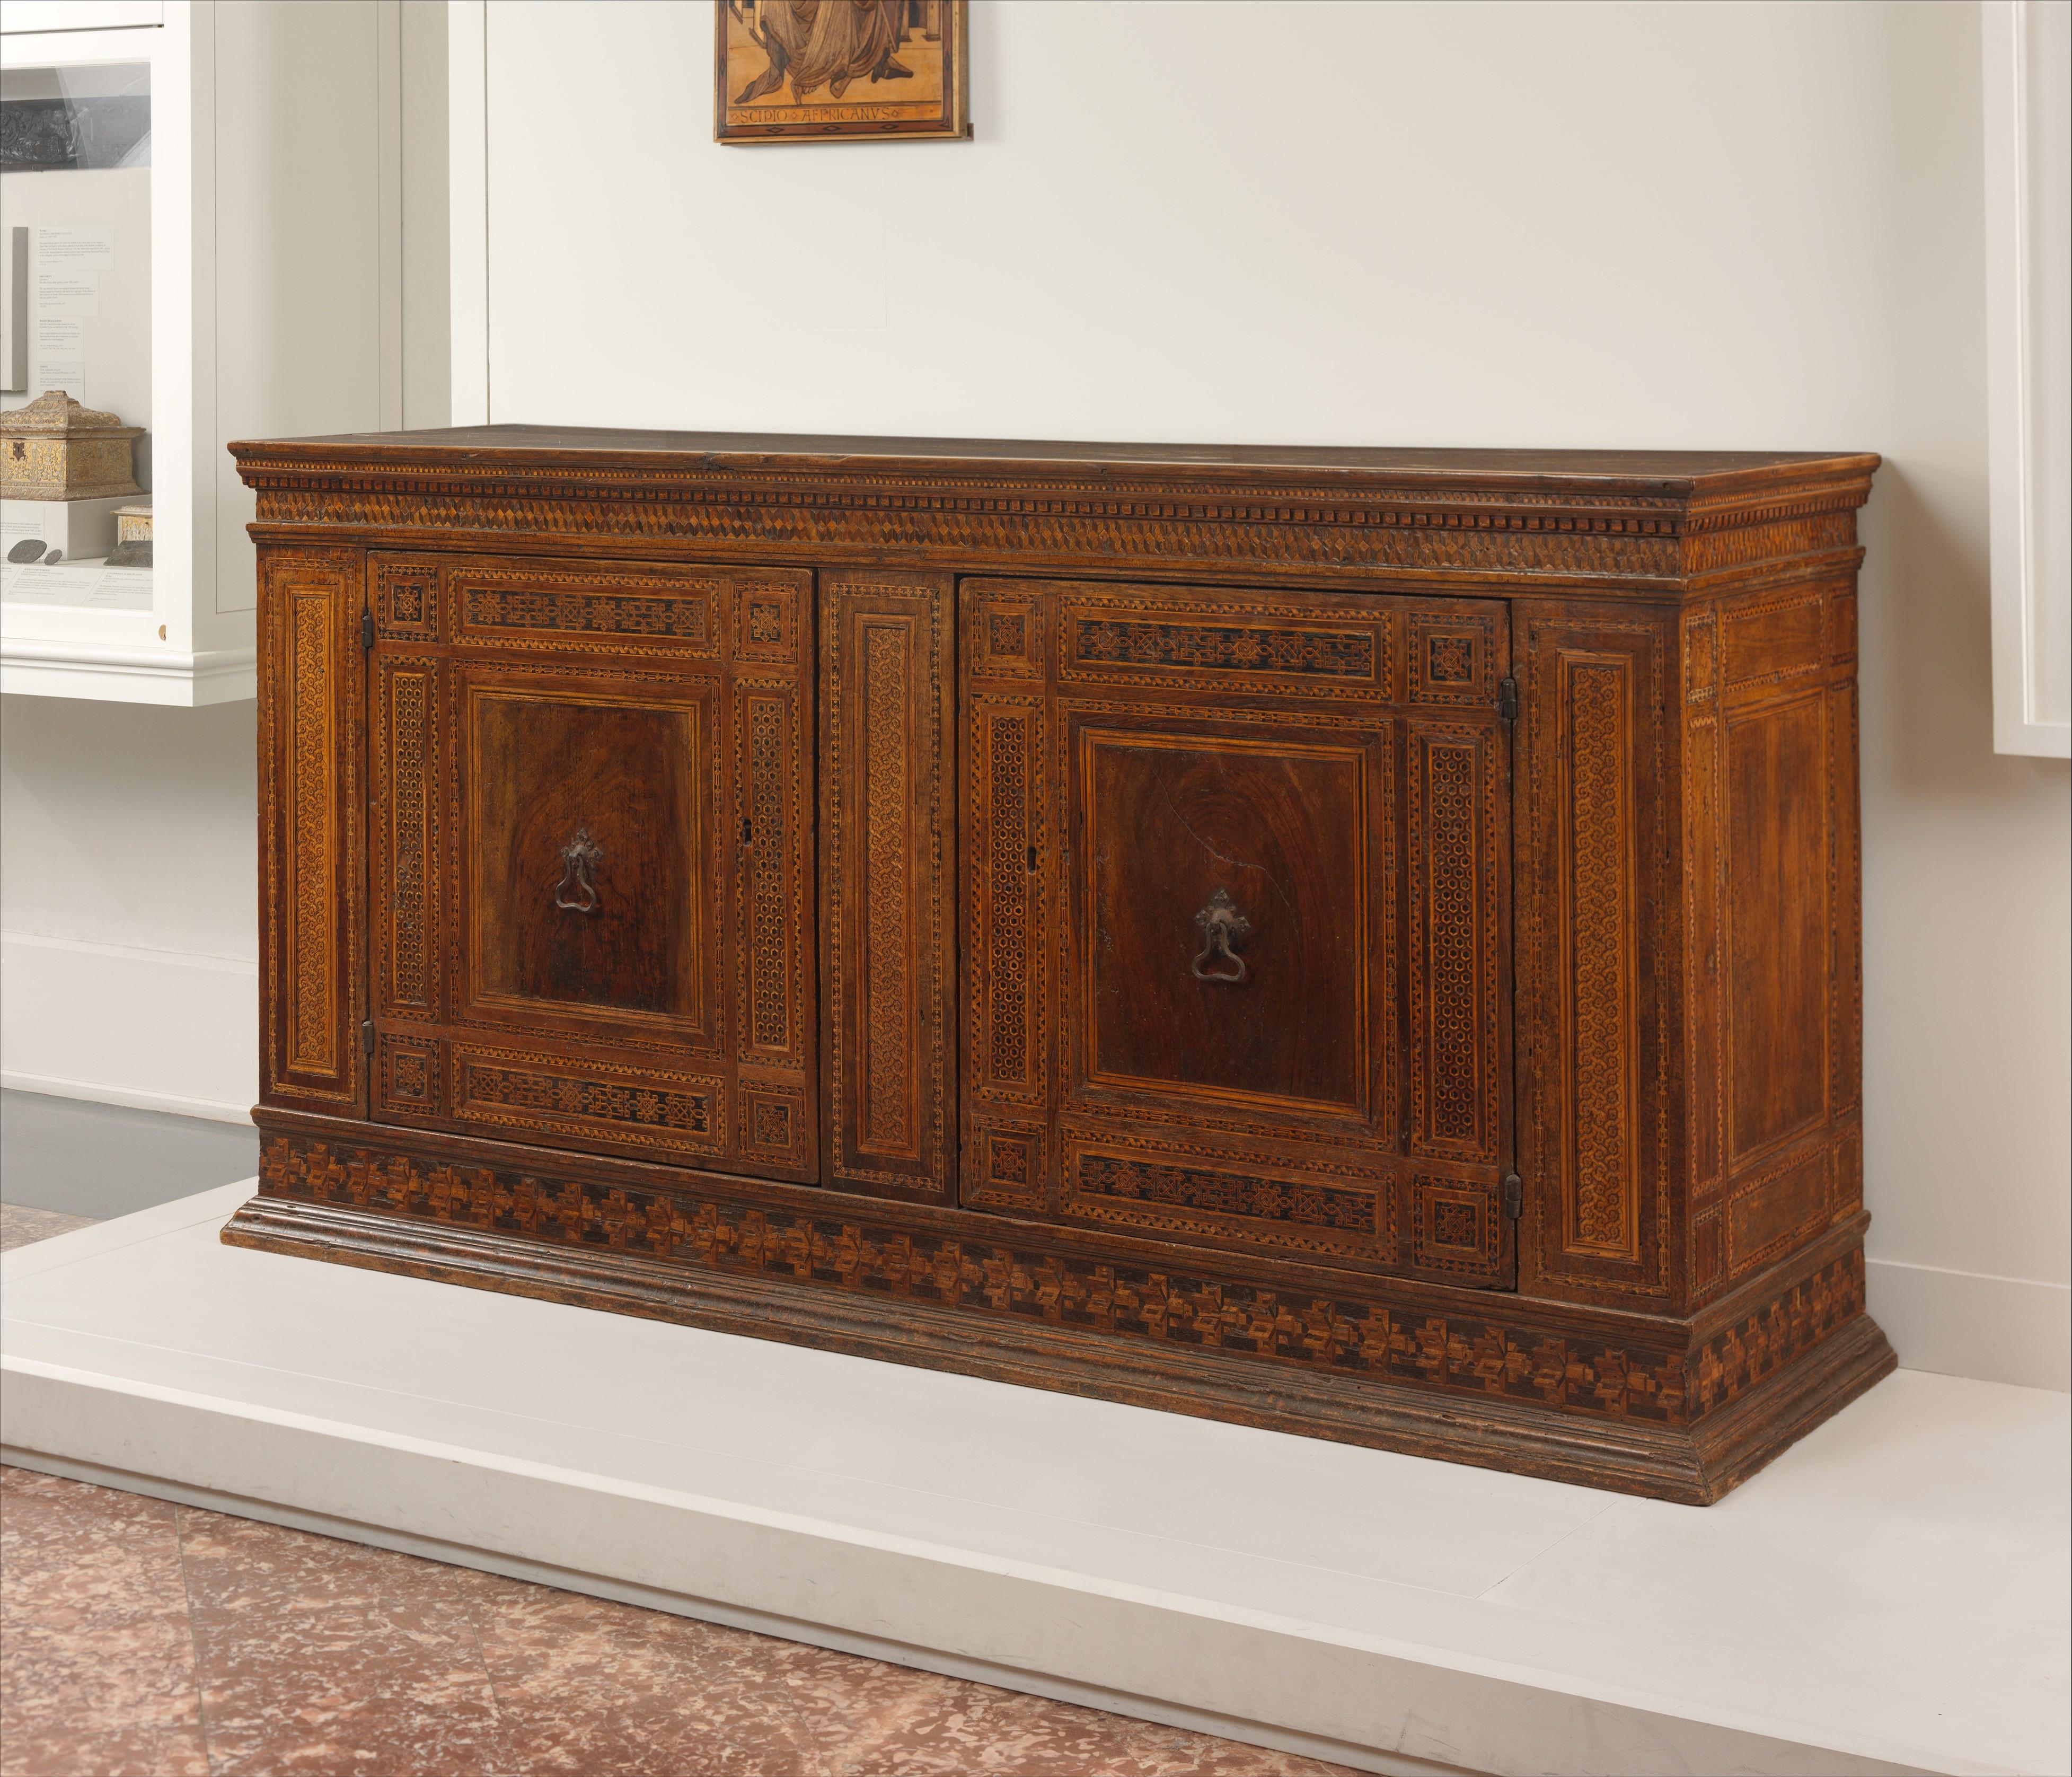 European Furniture in The Metropolitan Museum of Art: Highlights of ...